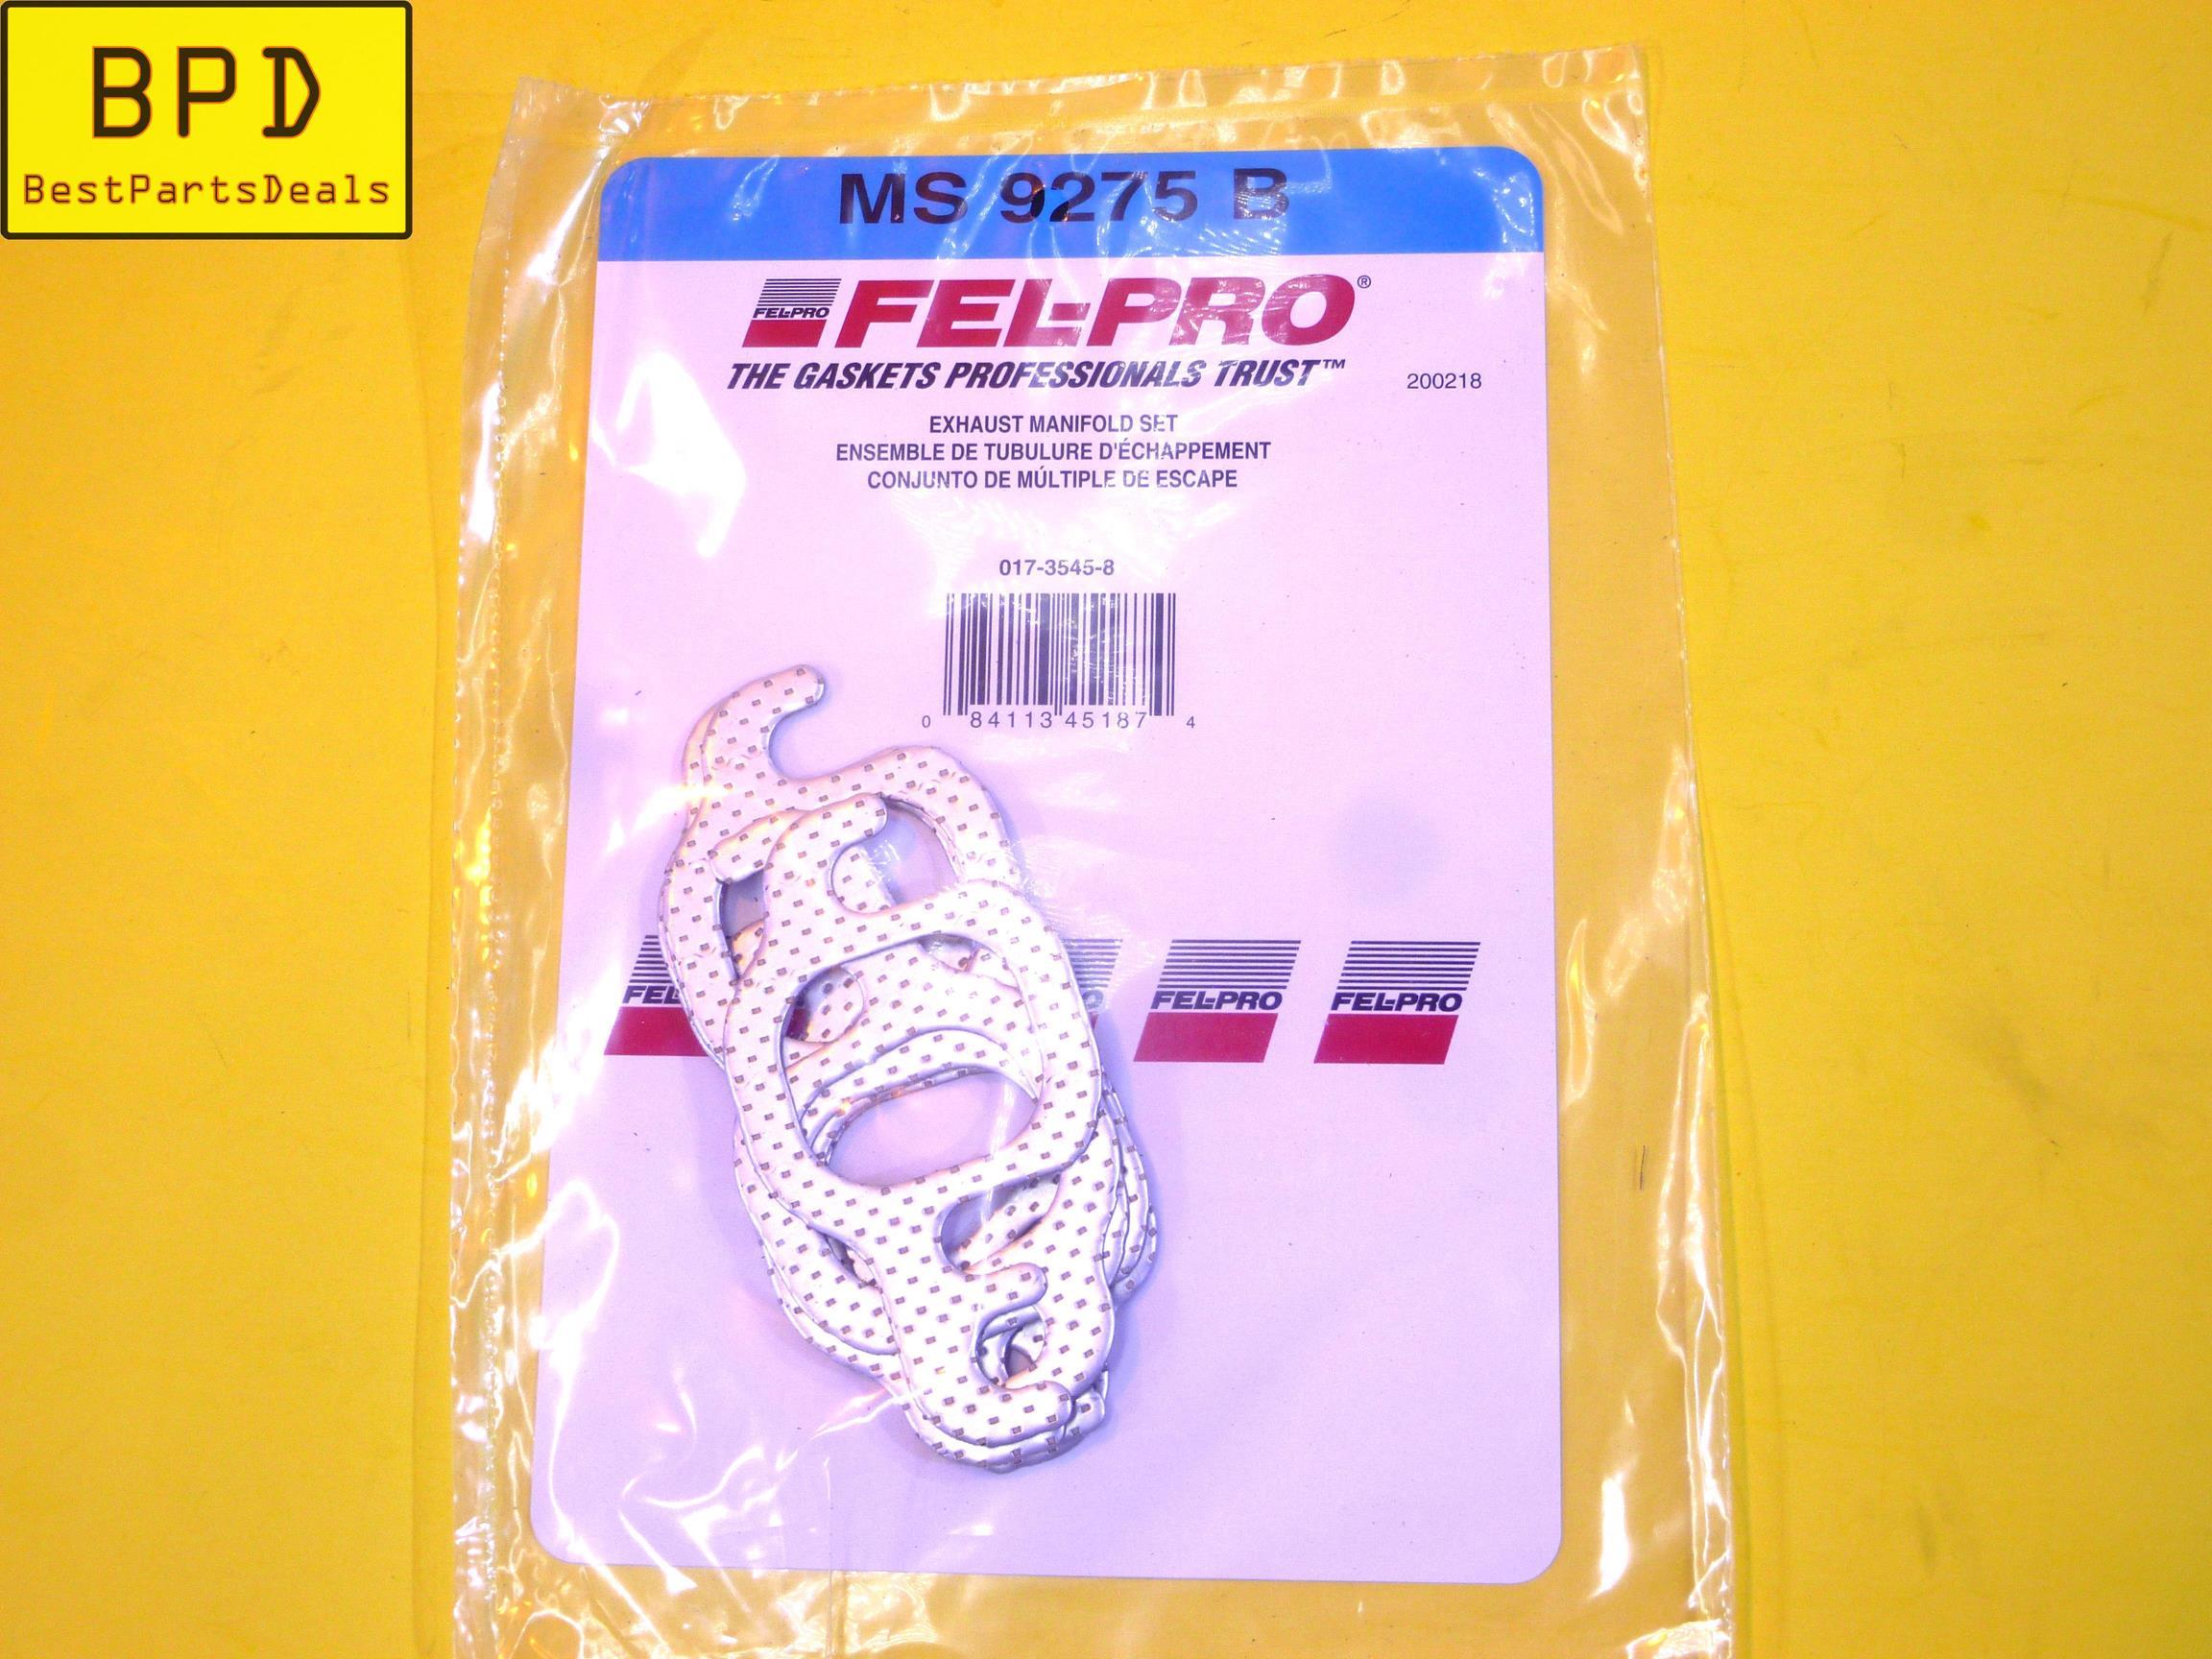 Exhaust Manifold Gasket Set Fel-Pro MS 9275 B